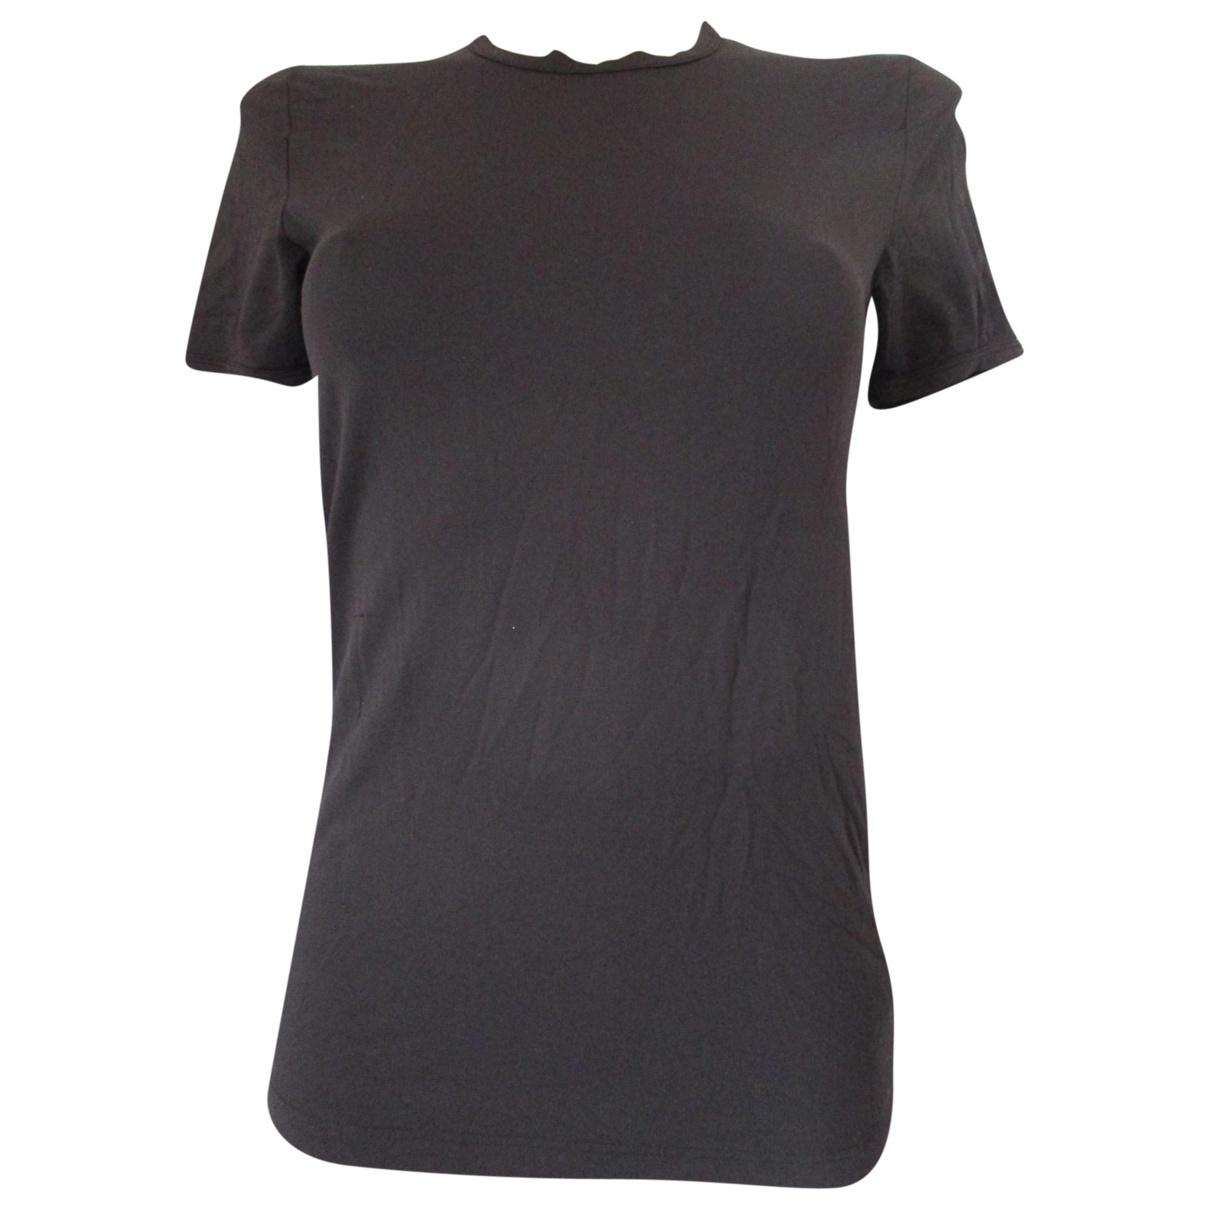 Dolce & Gabbana \N Black Cotton  top for Women S International